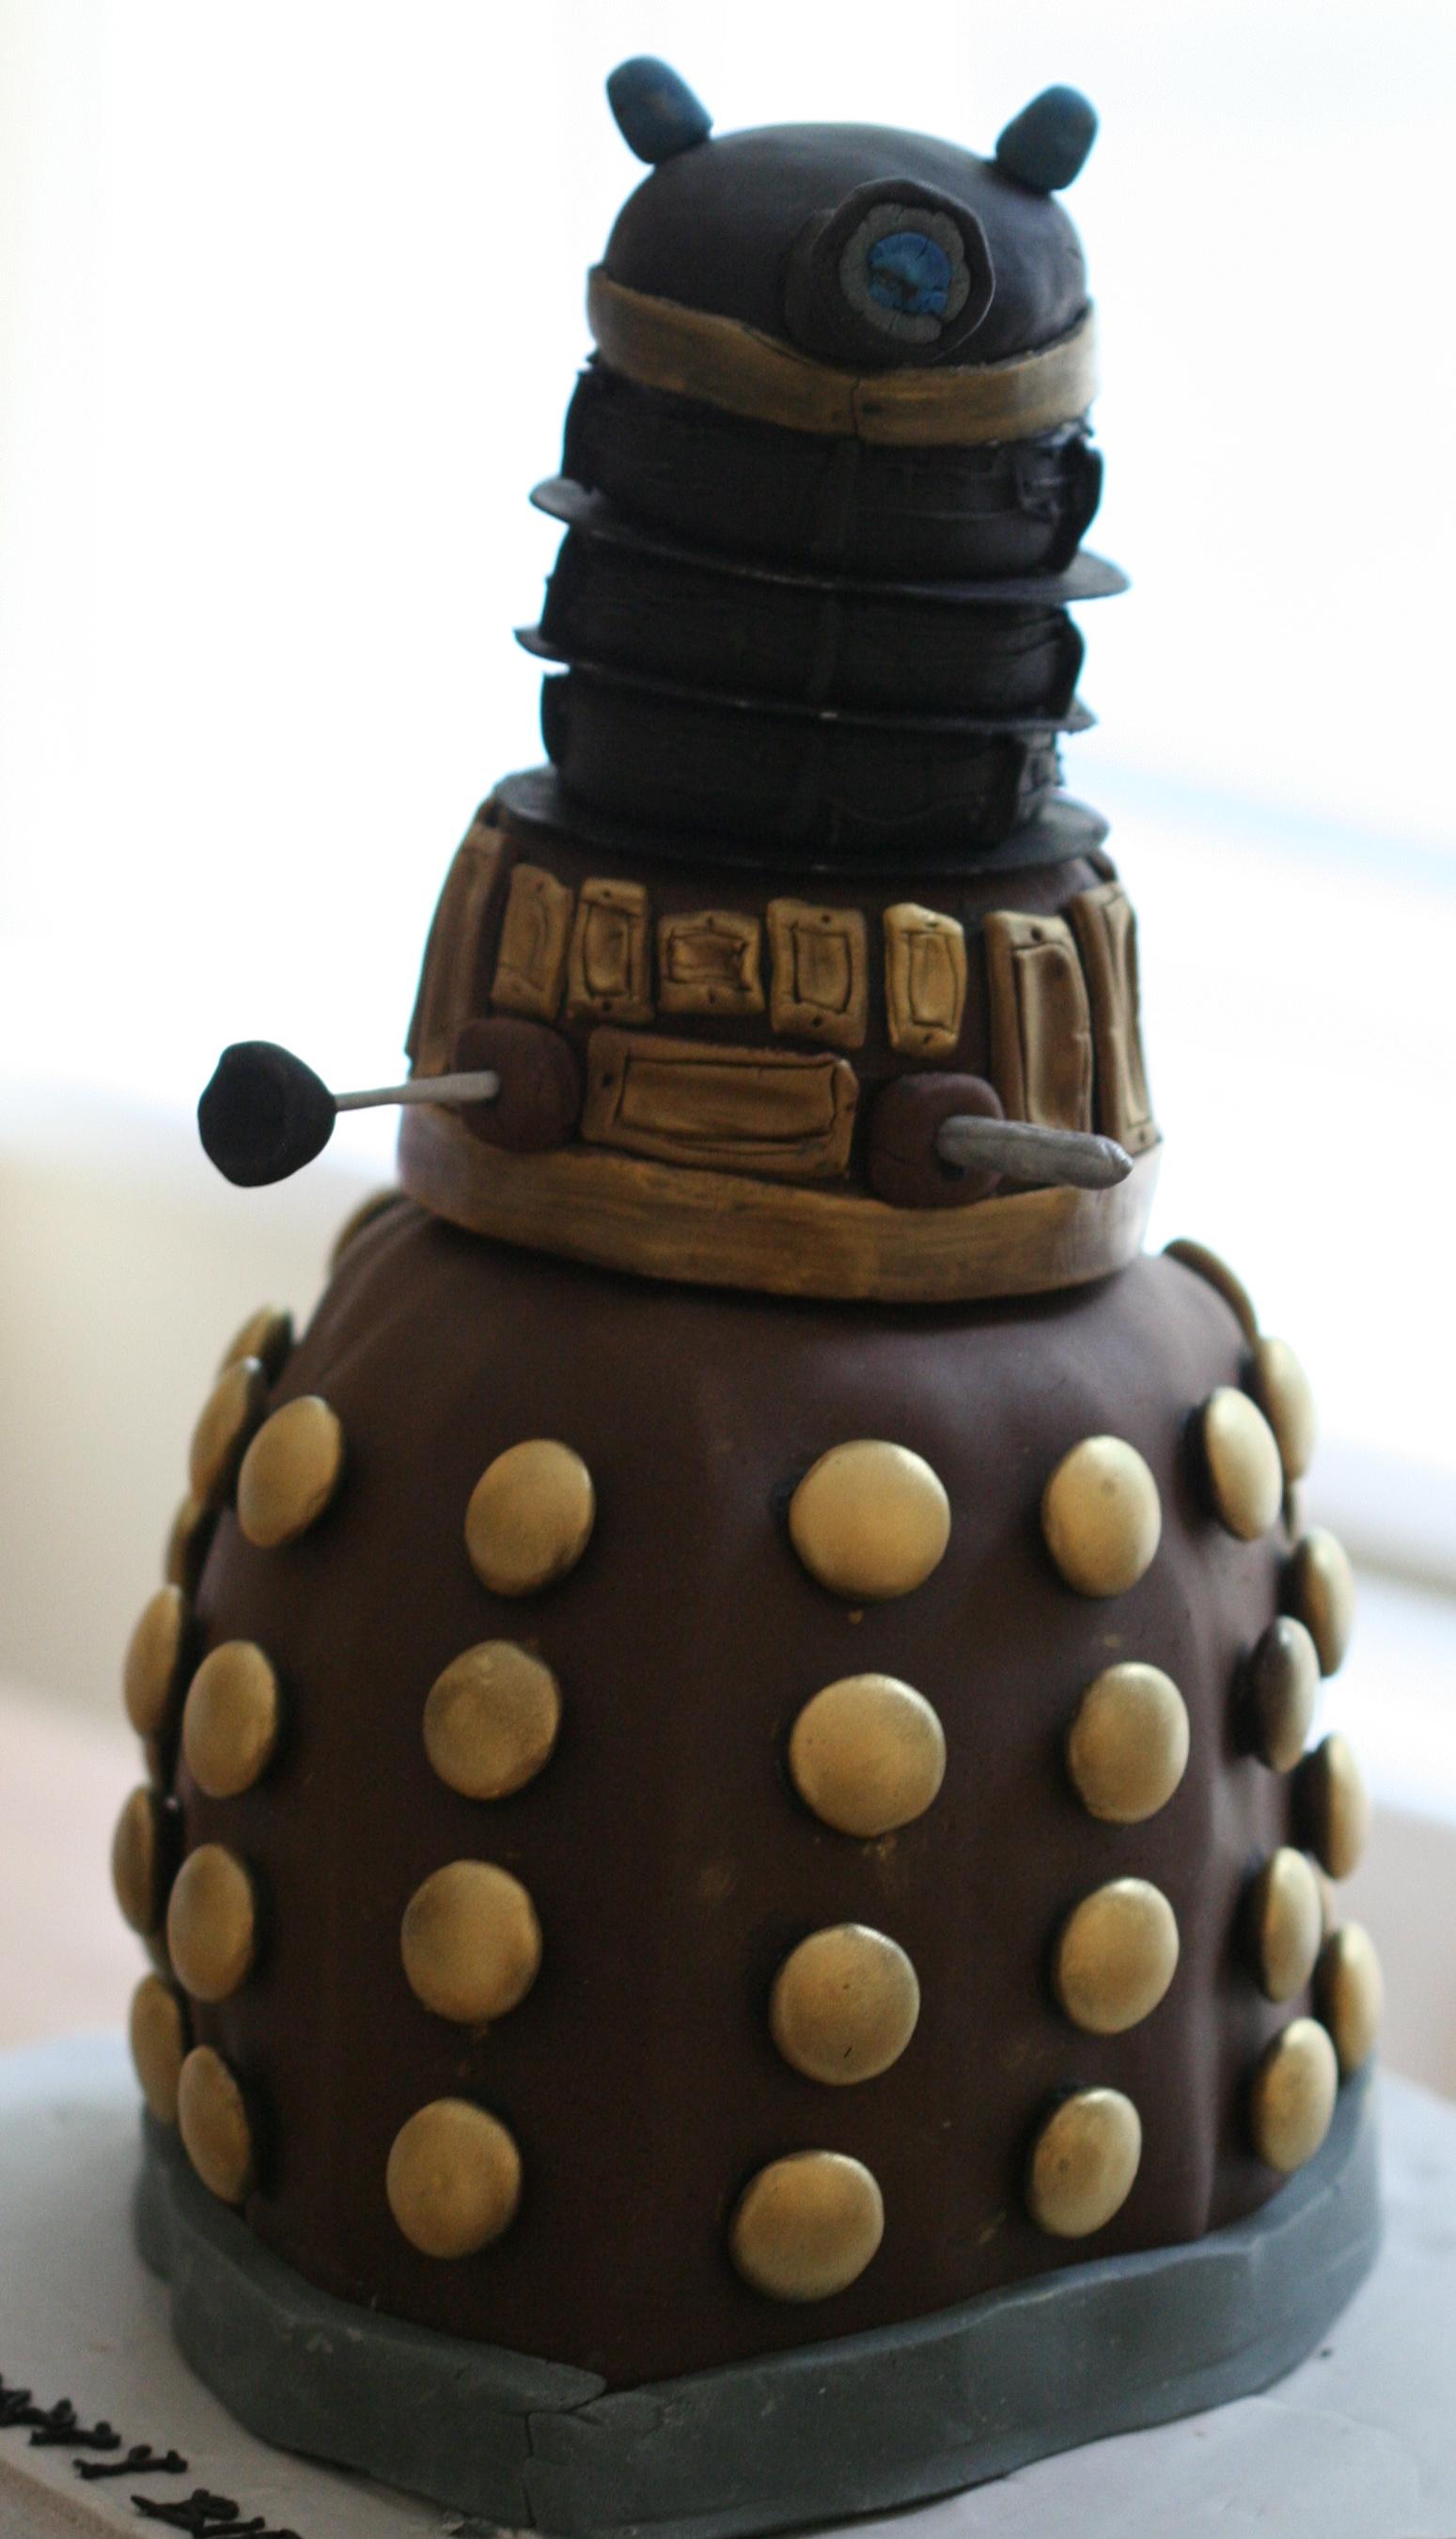 Sensational Dalek Cake Cakes Desserts And More Personalised Birthday Cards Veneteletsinfo